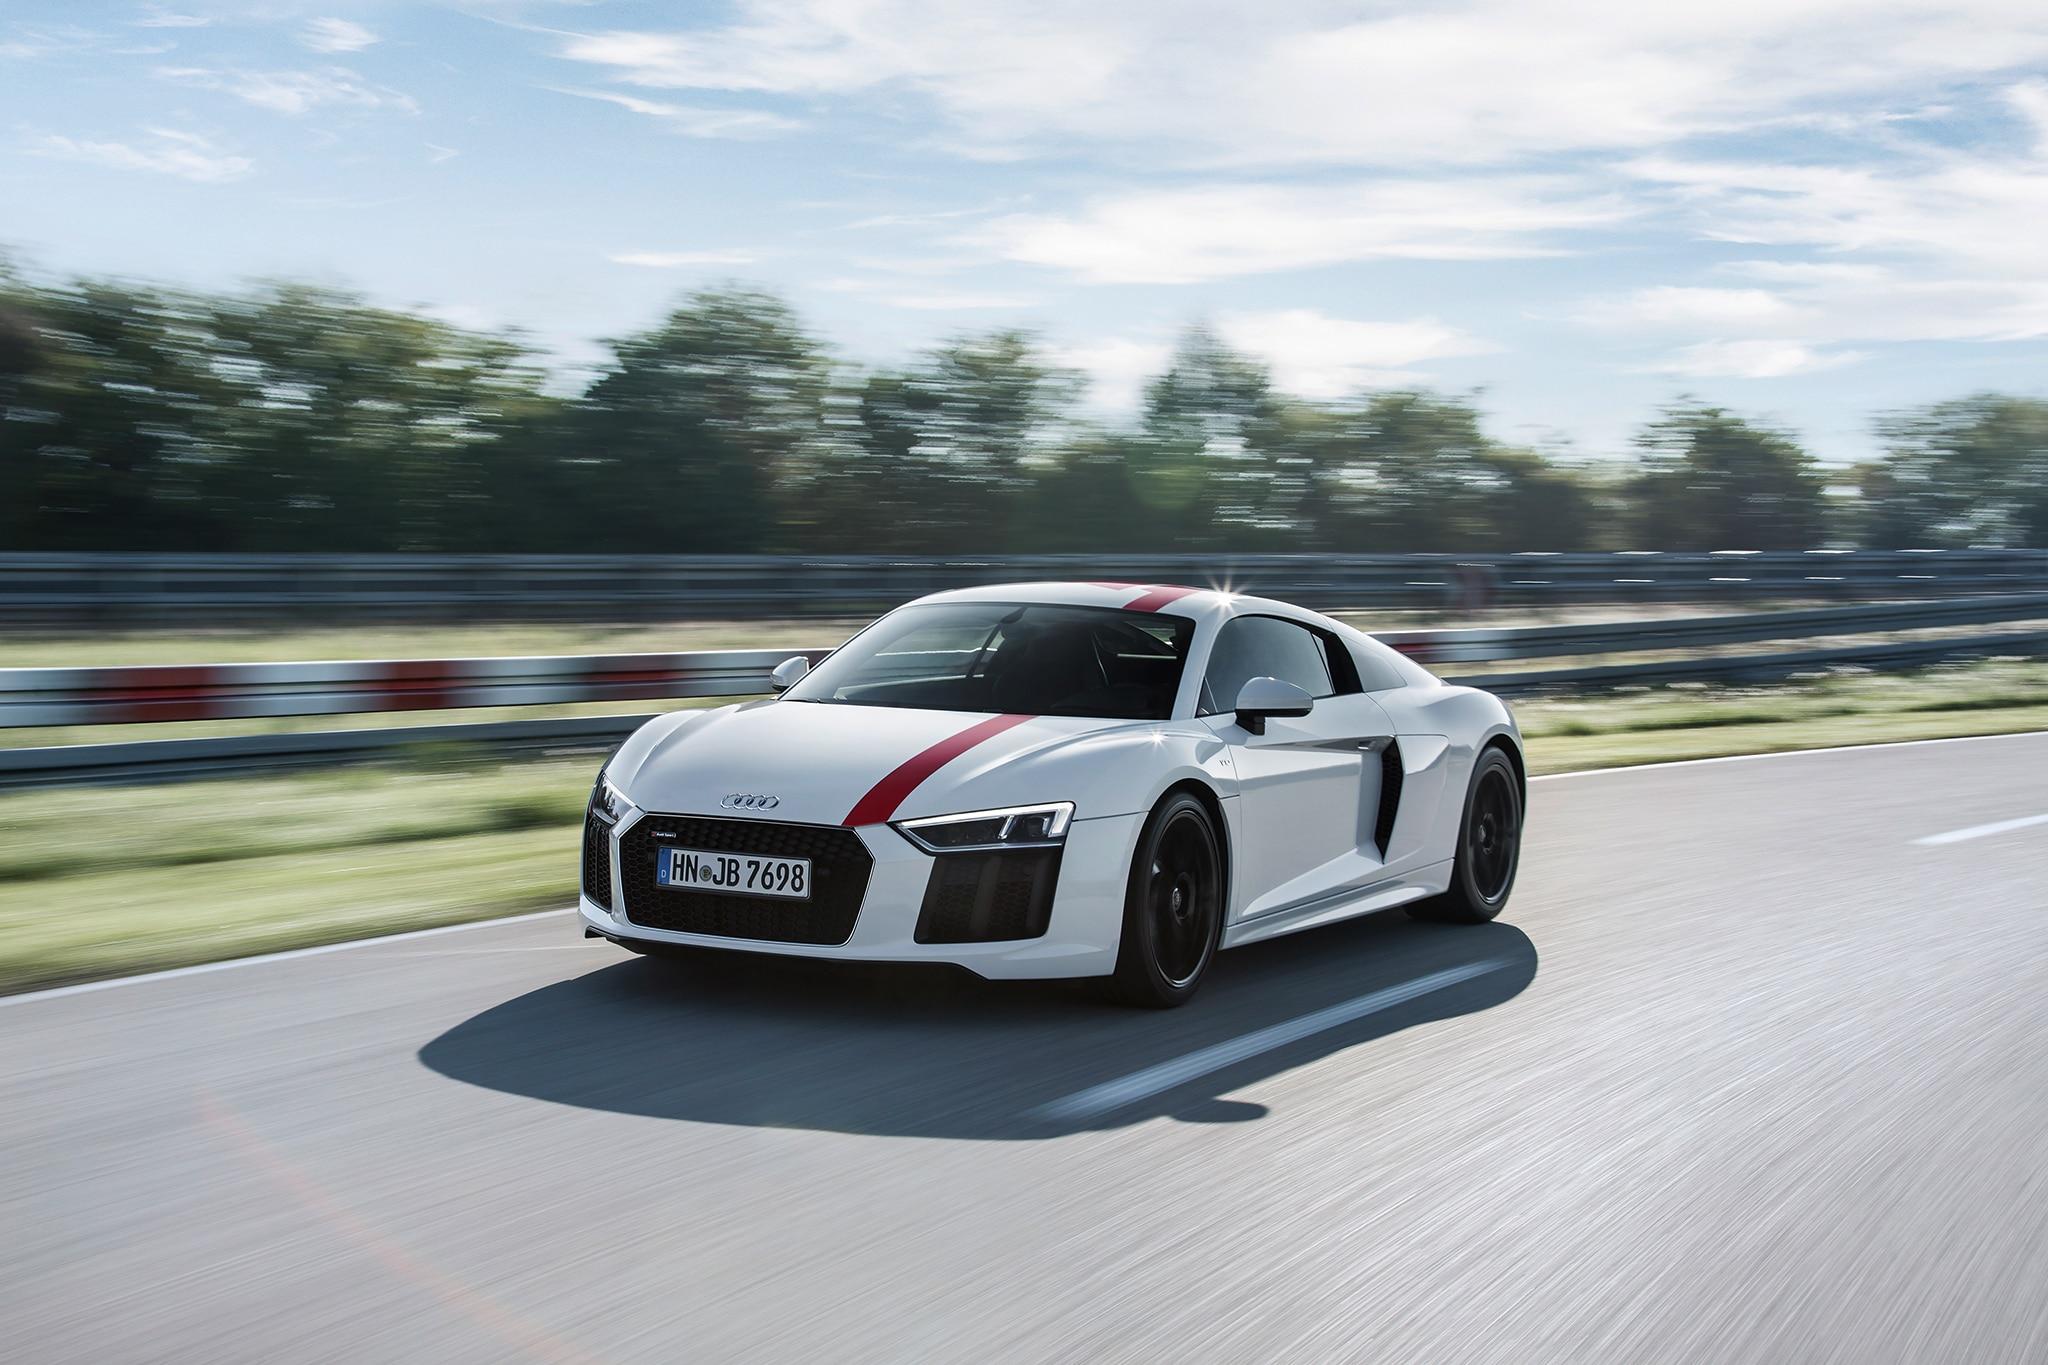 2018 Audi R8 Rws First Drive Review Automobile Magazine